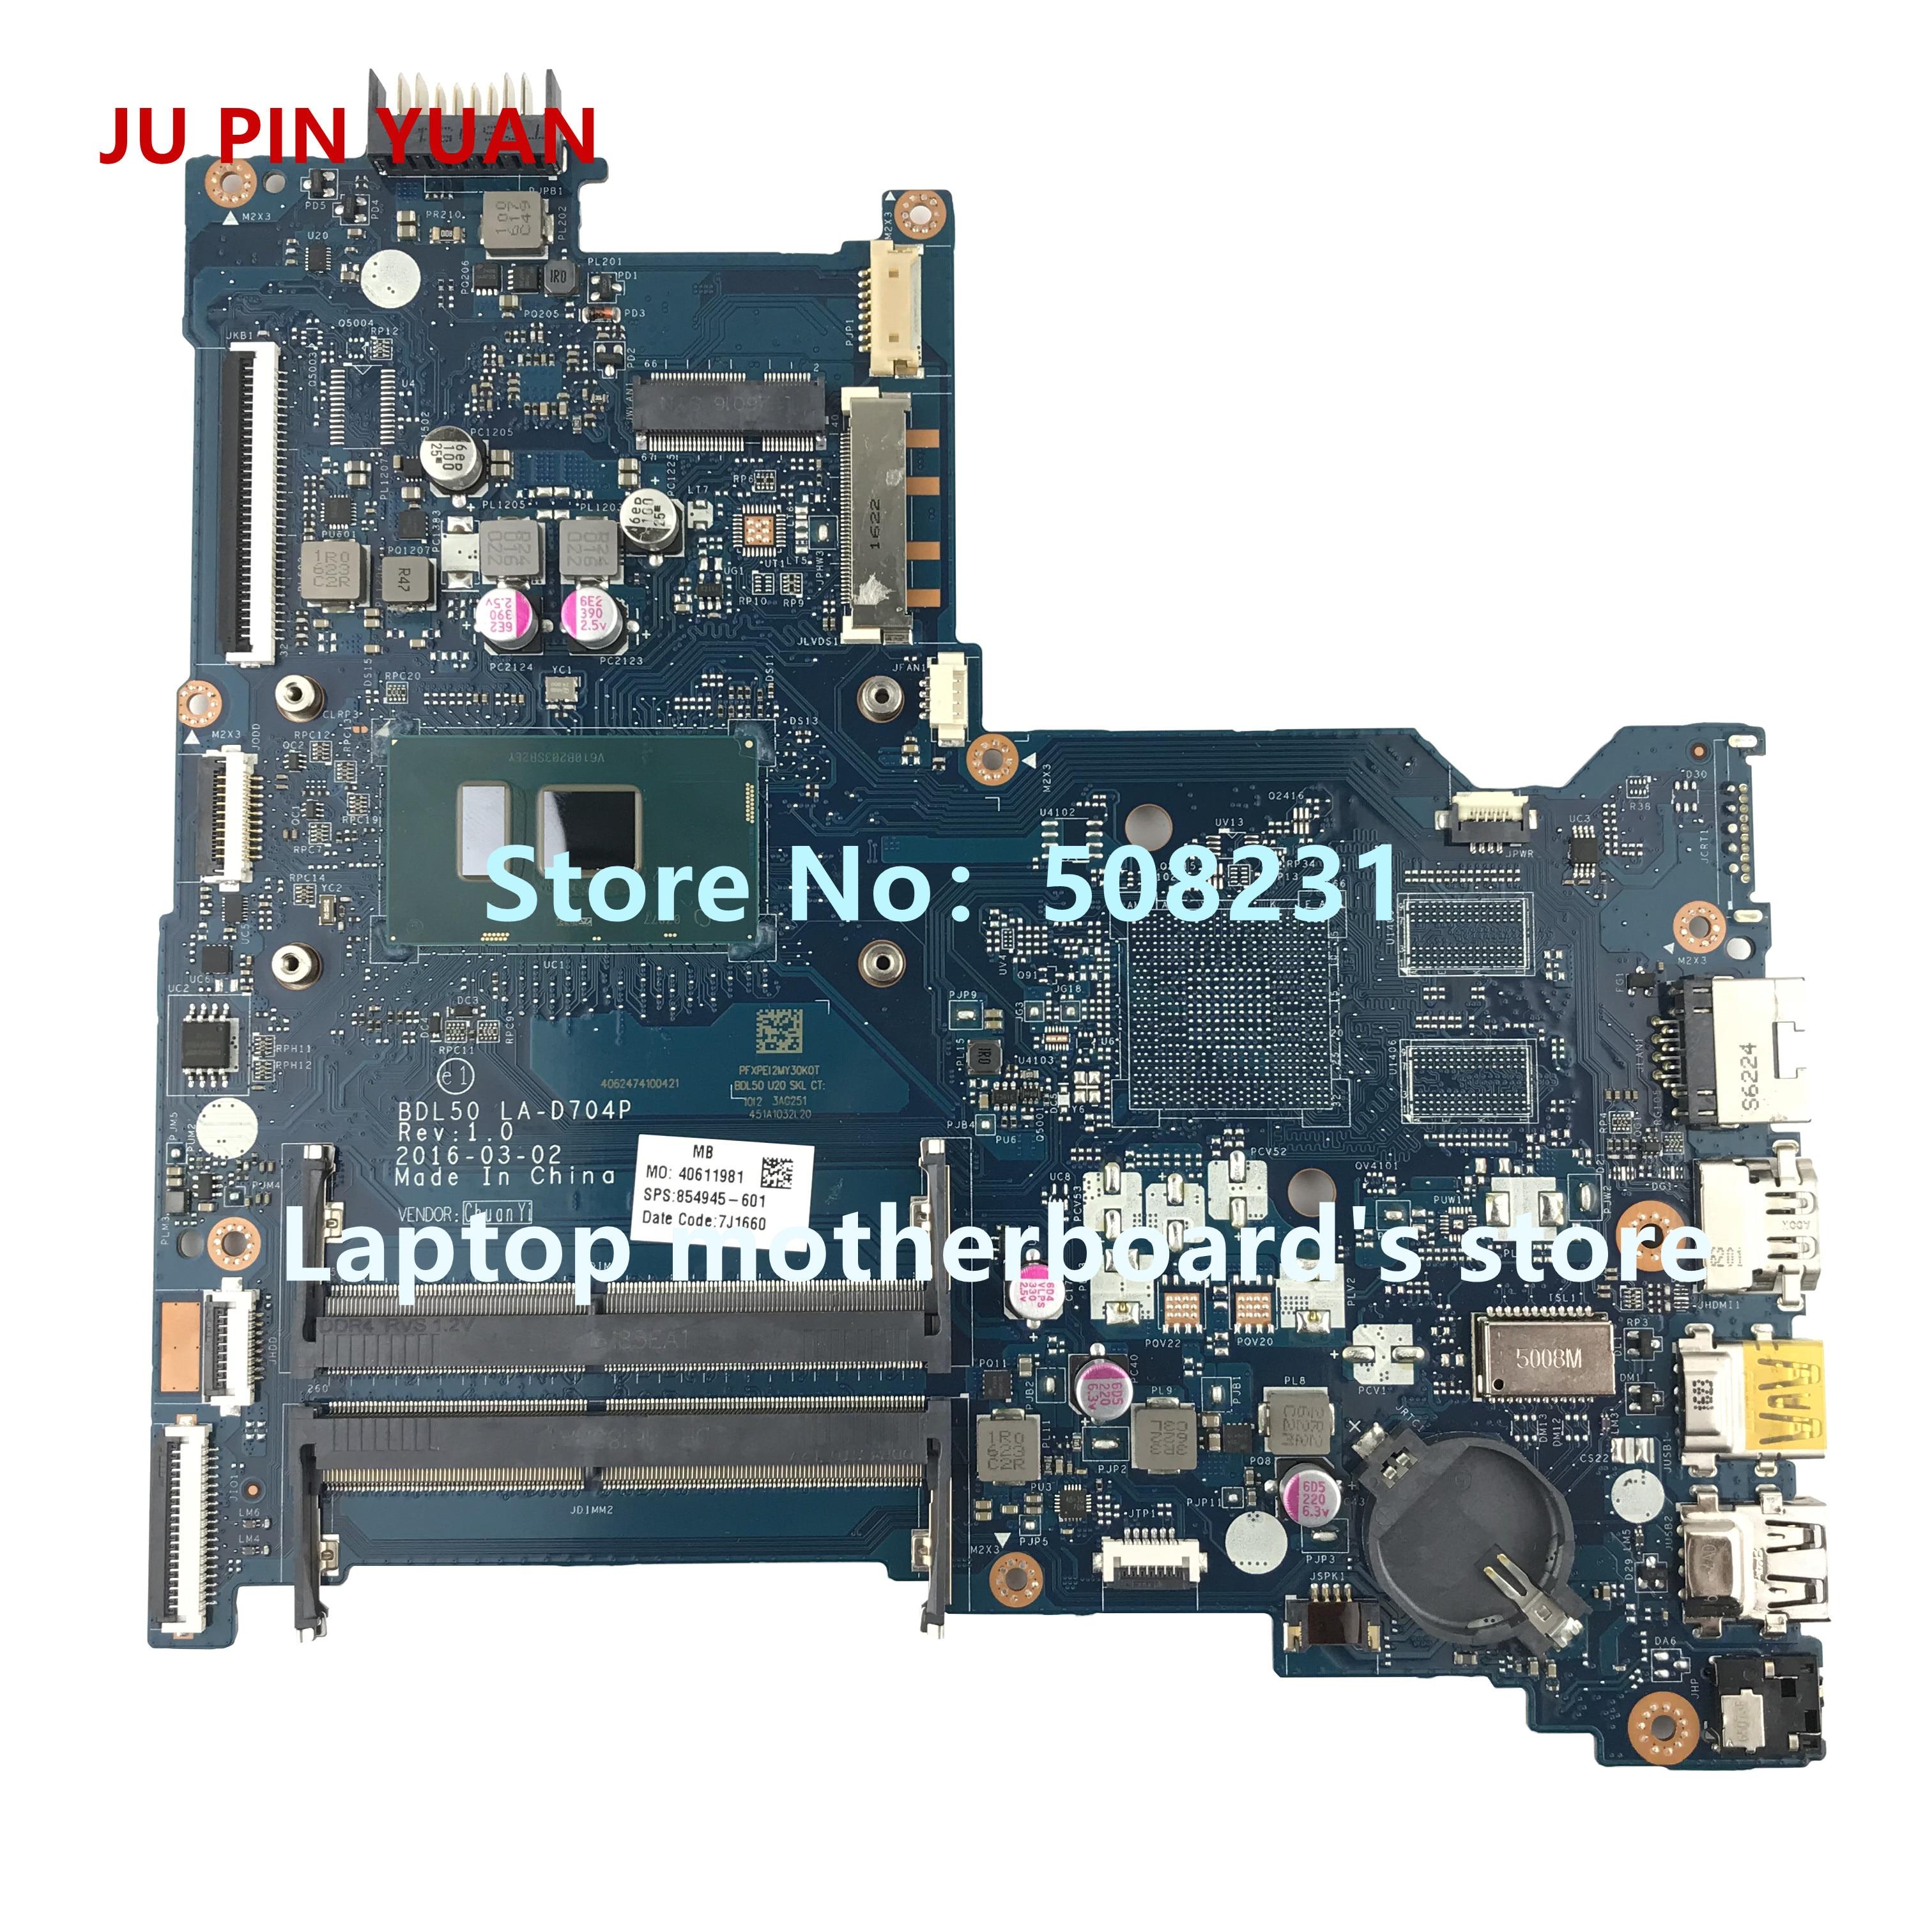 JU PIN YUAN 854945-601 854945-501 Mainboard For HP NOTEBOOK 15-AC 15-AY 15-ay096nr Laotop Motherboard BDL50 LA-D704P I5-6200U